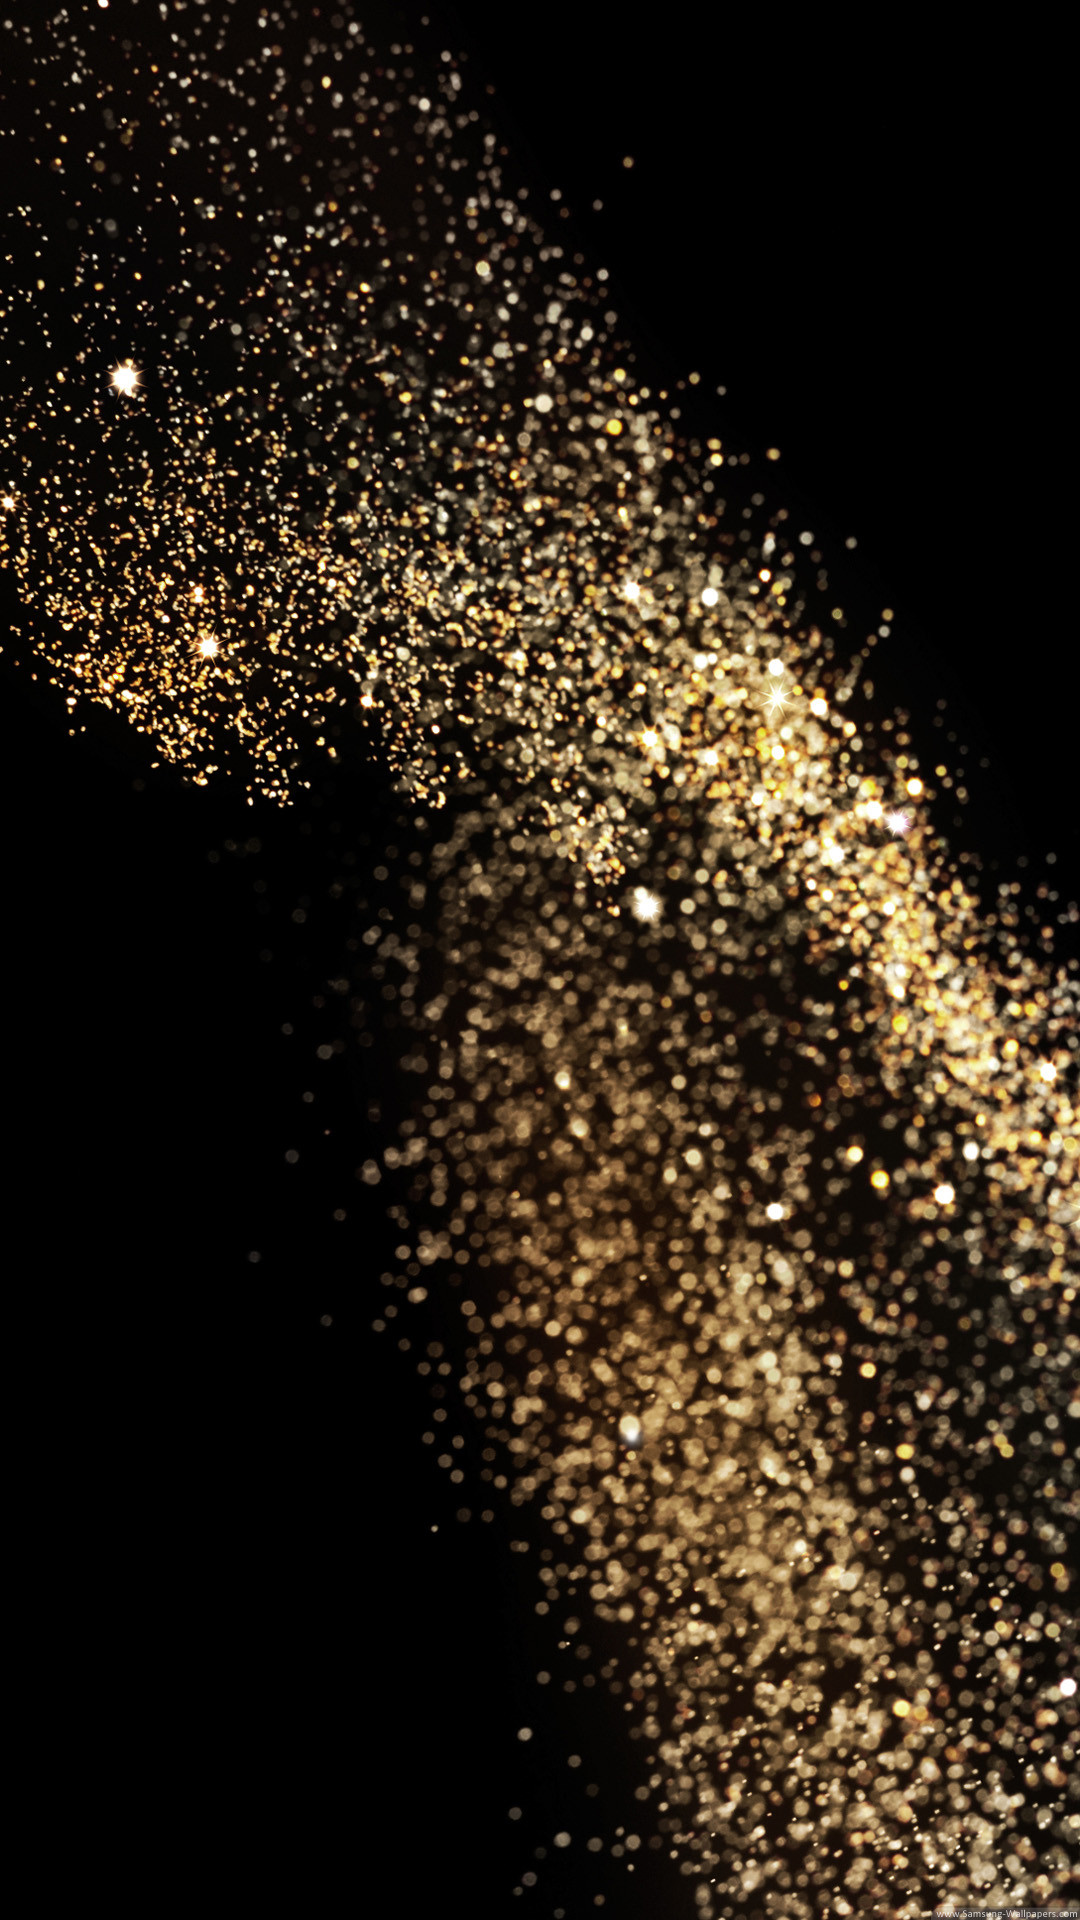 Phone Backgrounds, Iphone Wallpaper, Gold Glitter, Black Gold, Locks,  Screens, Phones, Walls, Funds